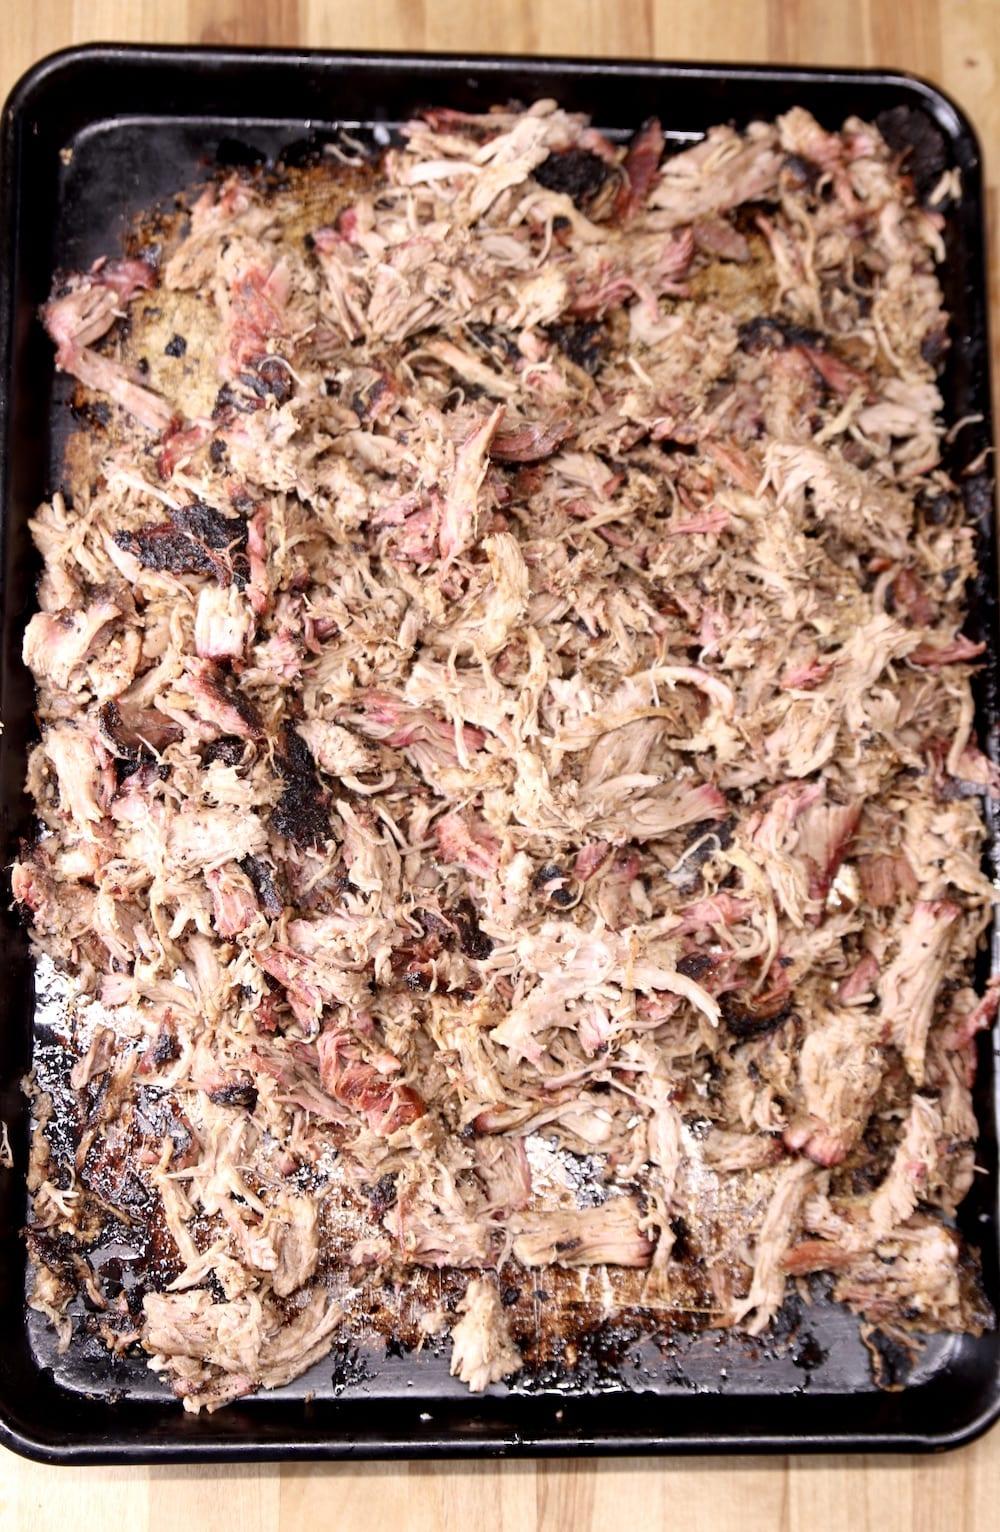 Smoky Pulled Pork on a sheet pan